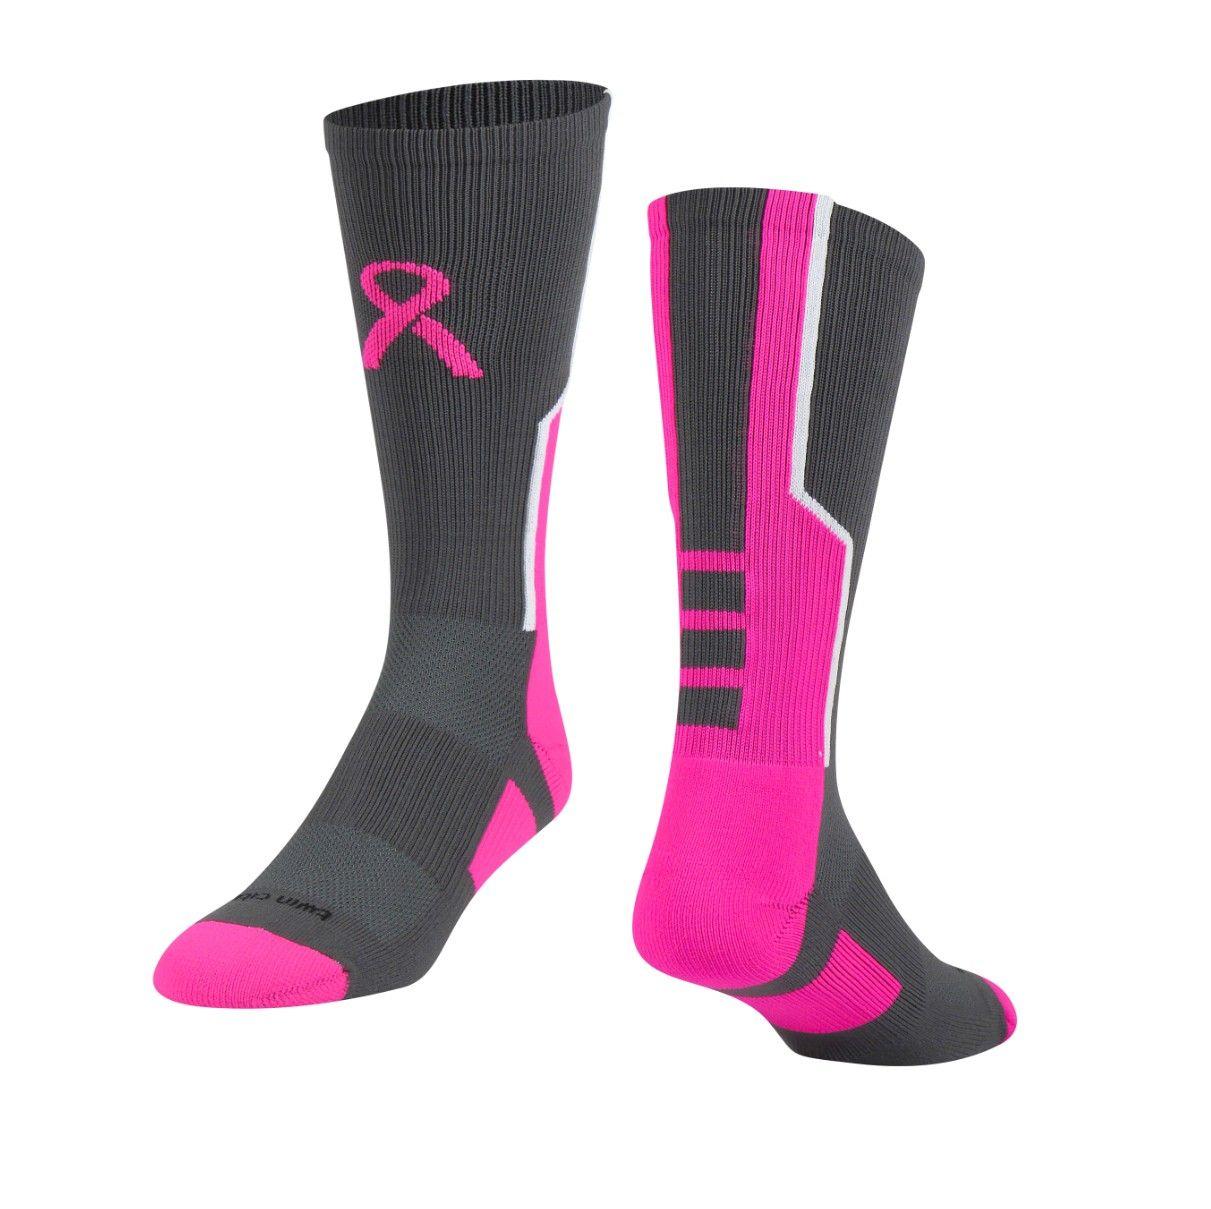 Breast Cancer Awareness Baseline Football Socks - Breast Cancer Awareness Baseline Football Socks Football Socks